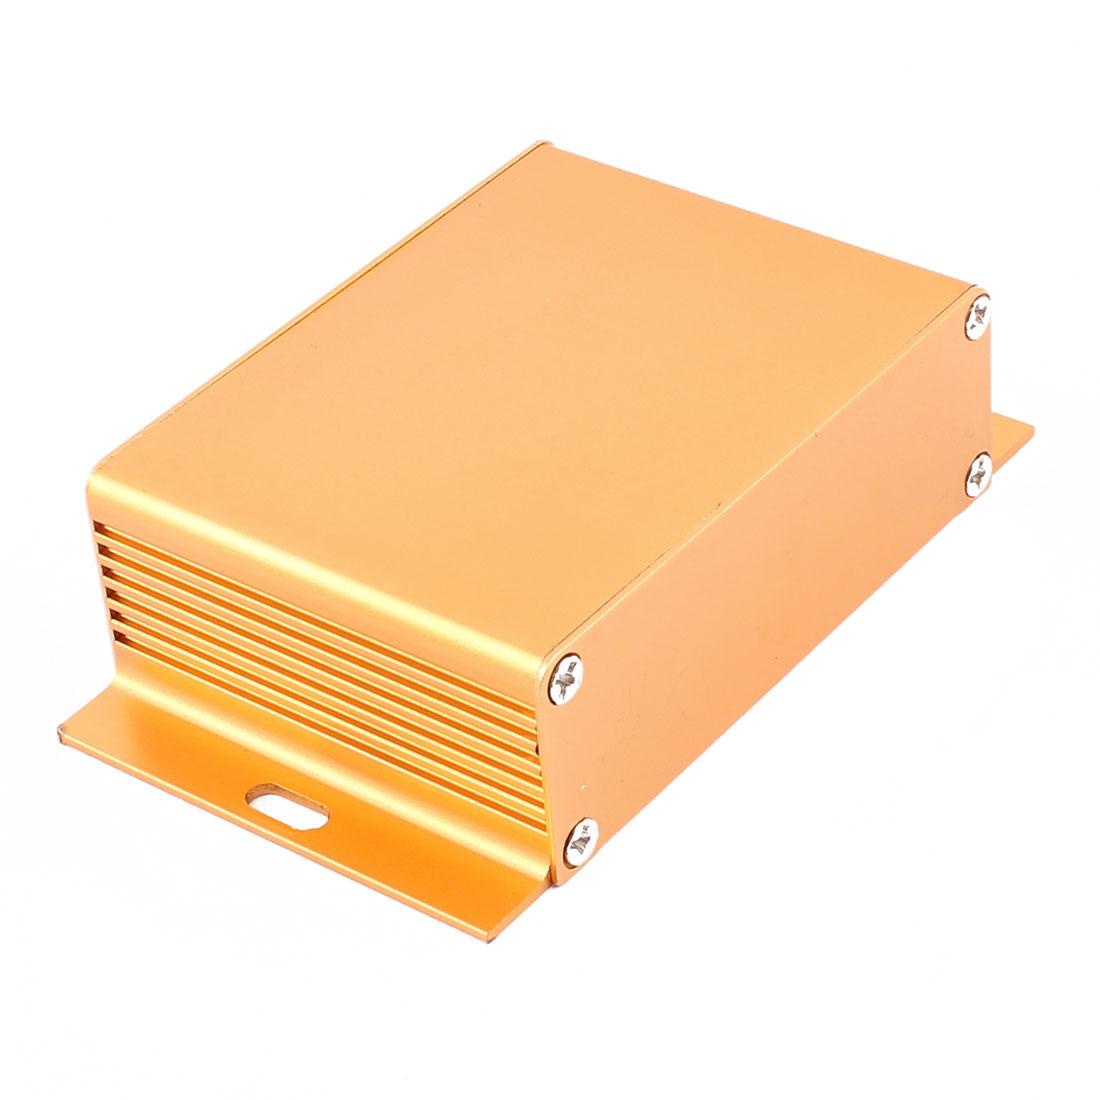 62 x 104 x 28mm Multi-purpose Electronic Extruded Aluminum Enclosure Gold Tone